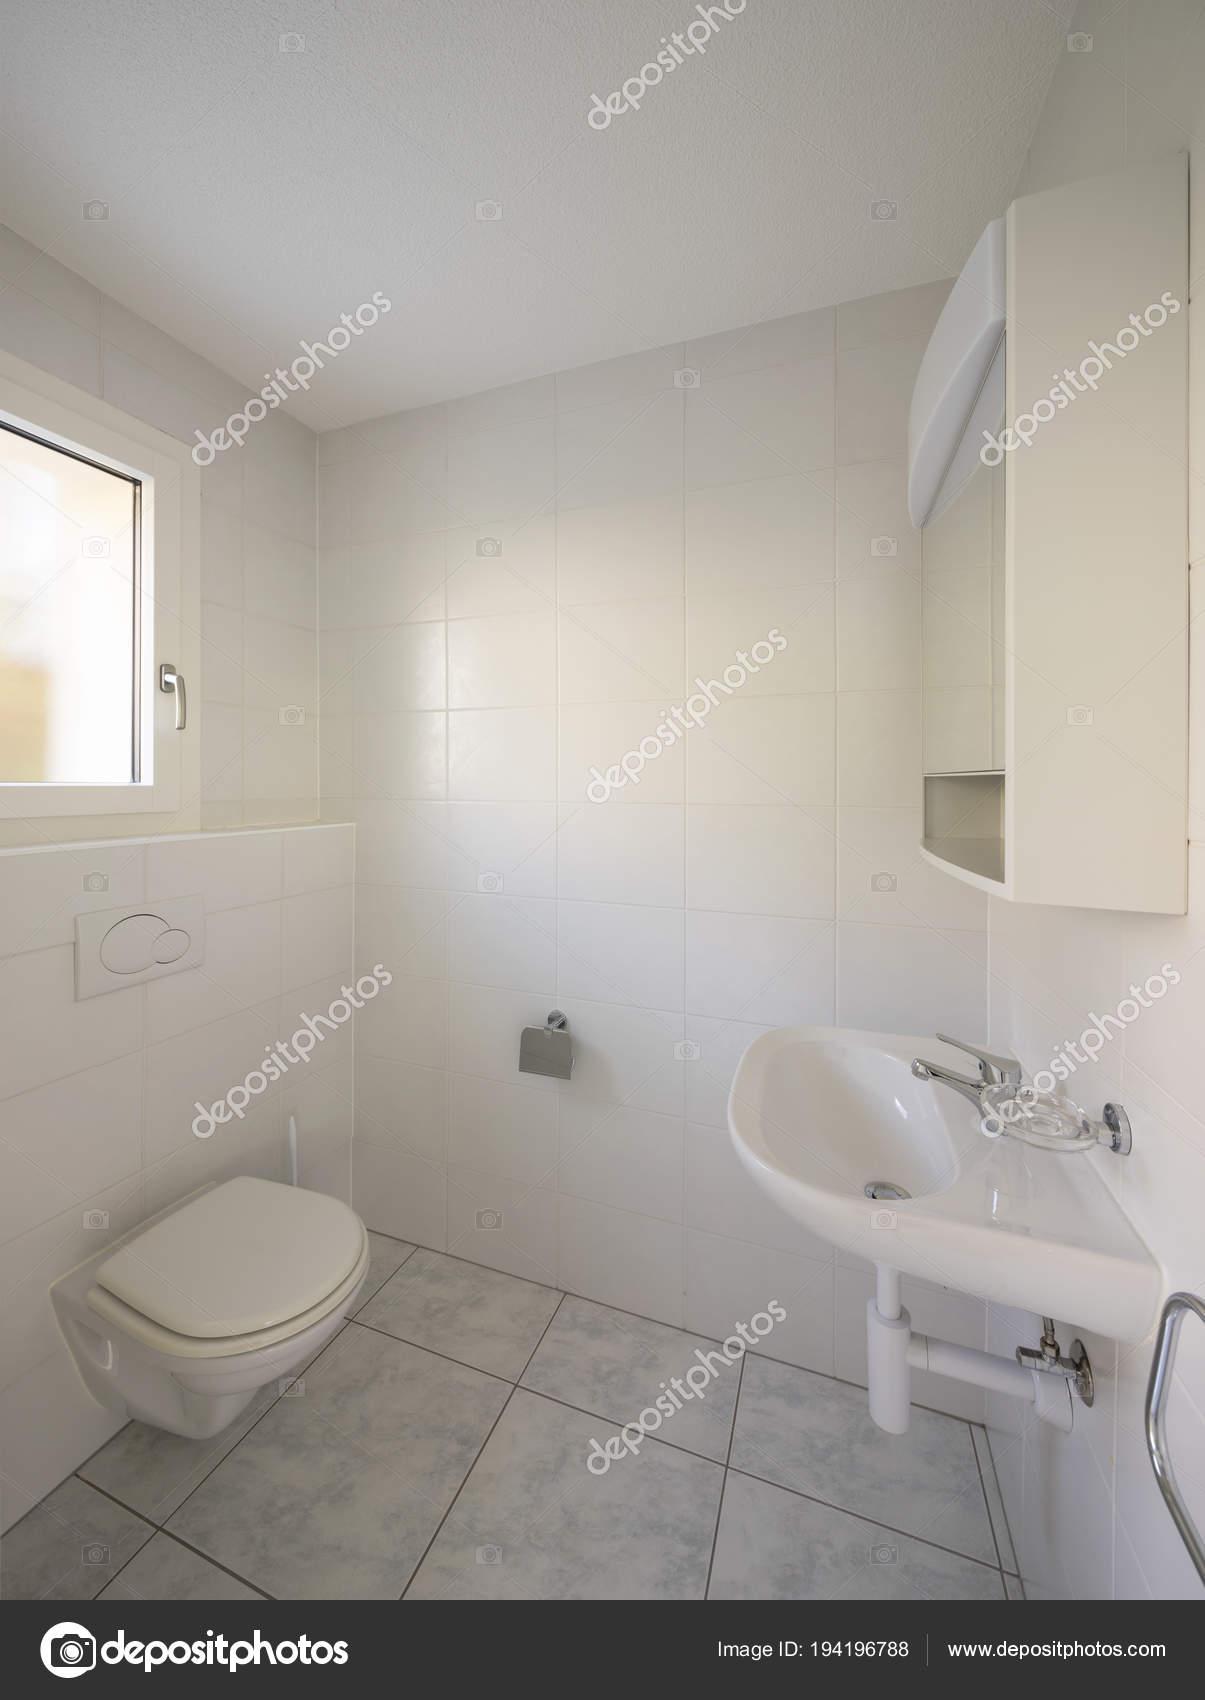 Fliesen Badezimmer Retro Retro Badezimmer So Bringst Du Nostalgie